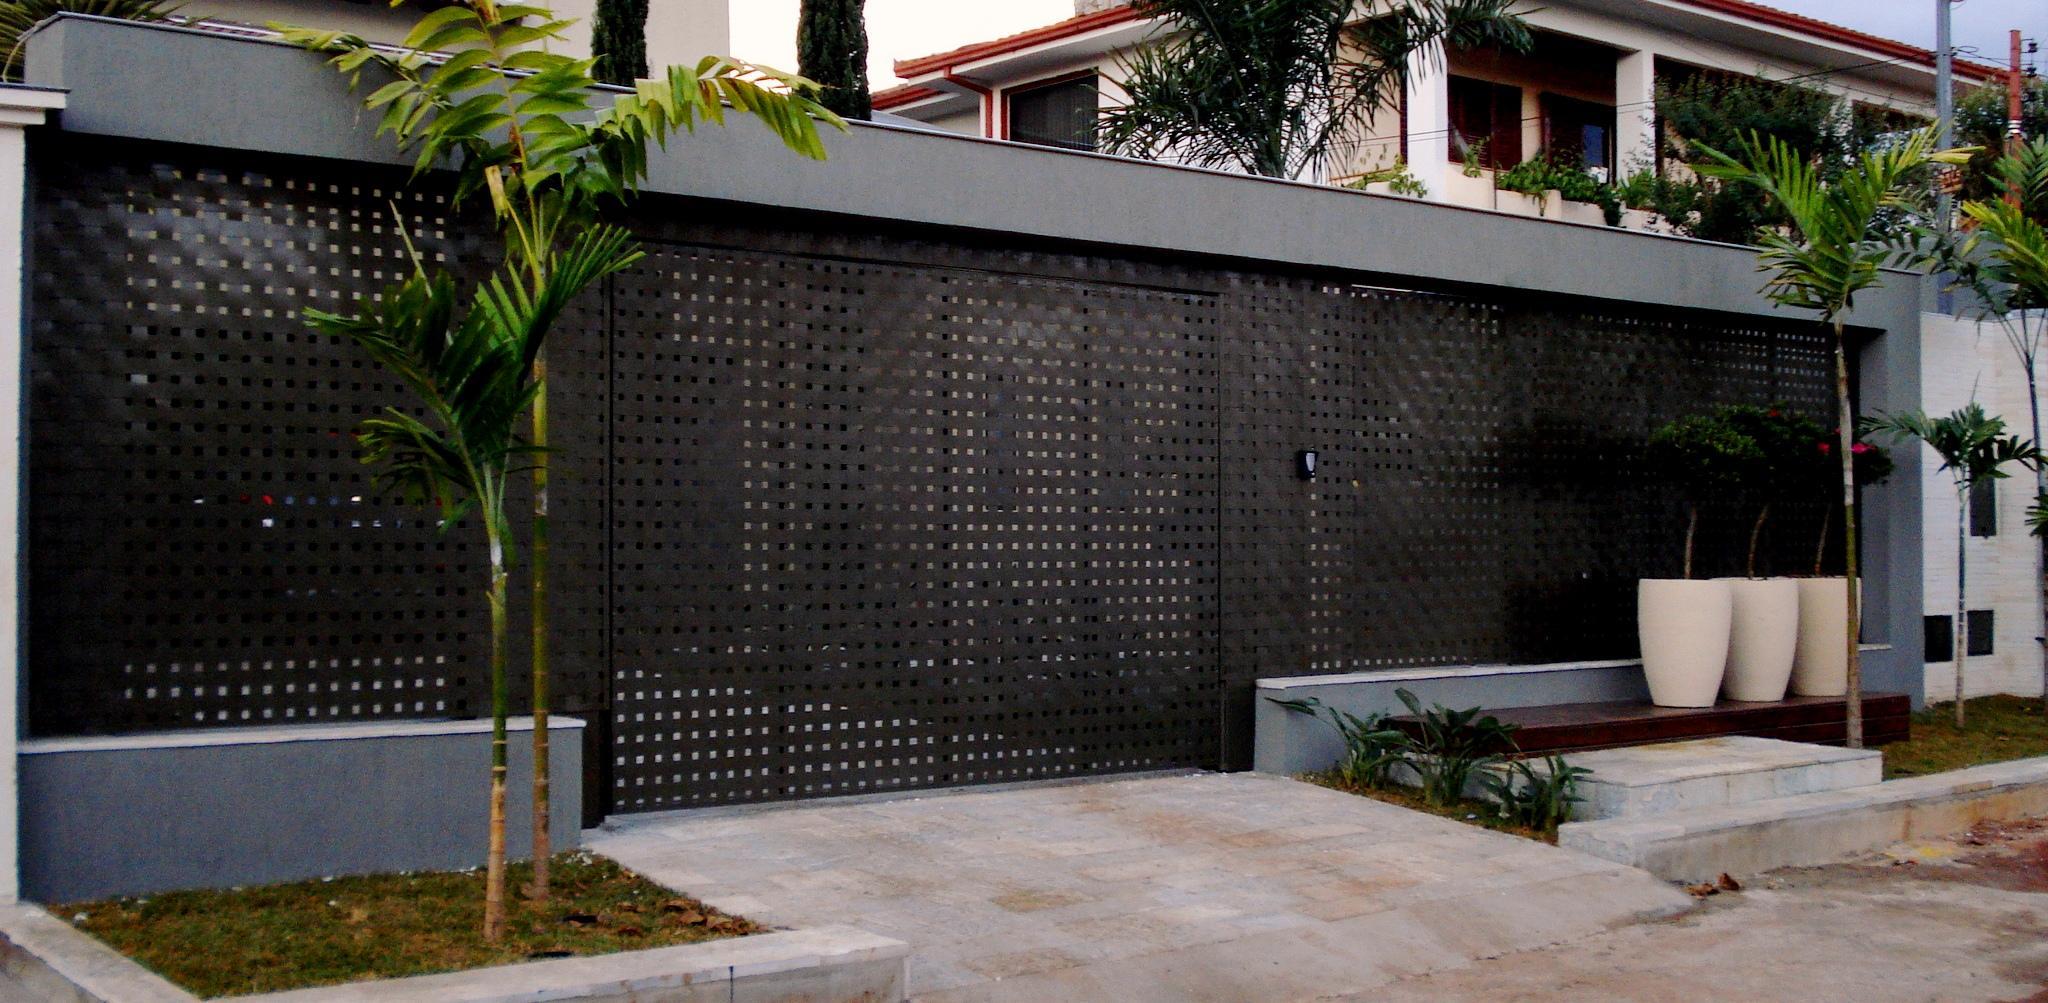 Suficiente 60 Modelos de Muros Residenciais: Fachadas, Fotos e Dicas XX95